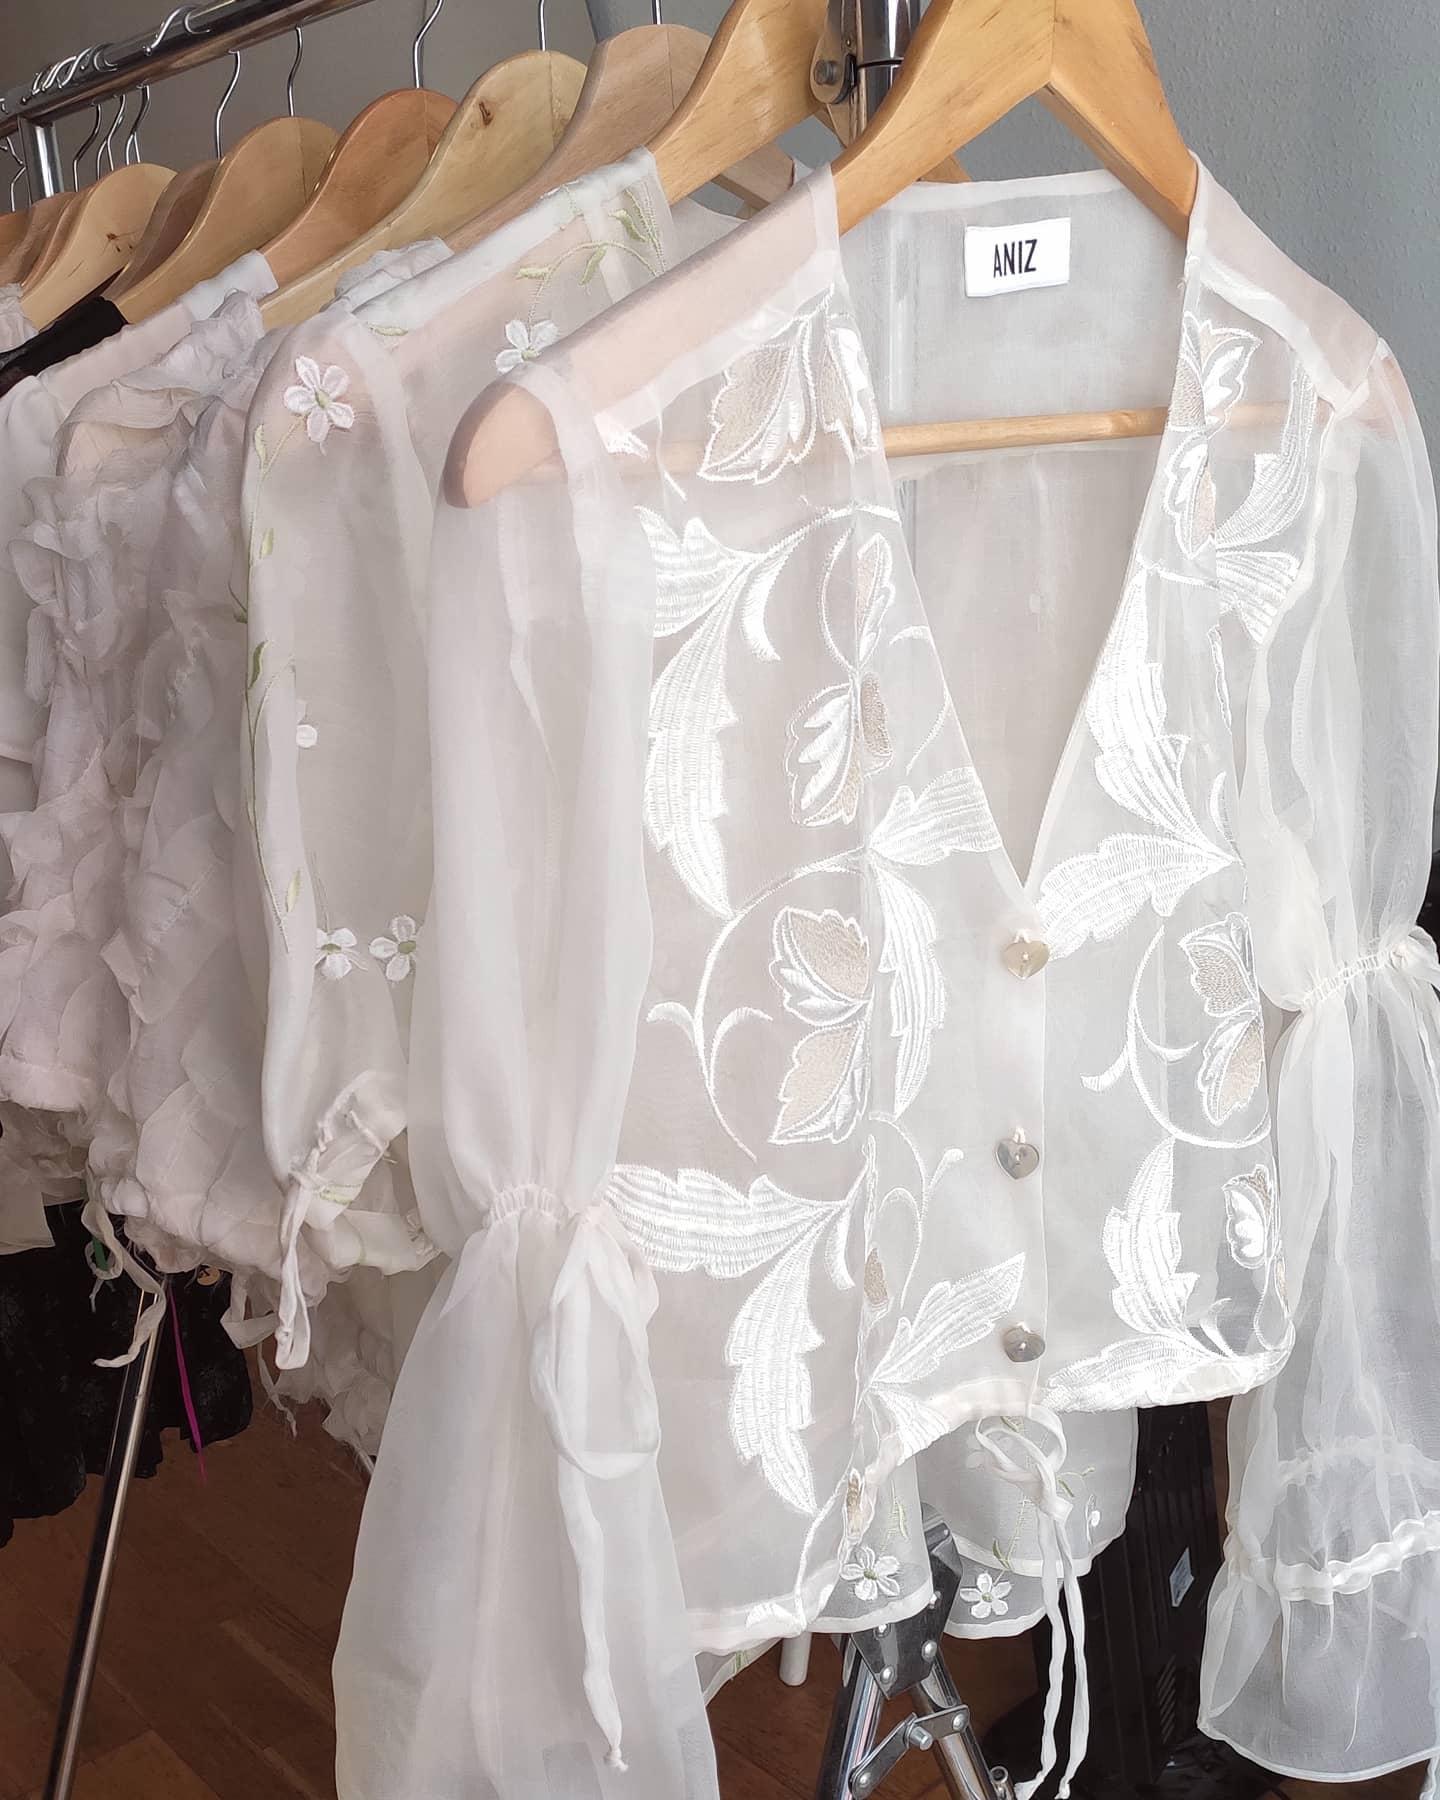 ANIZ reciclaje textil